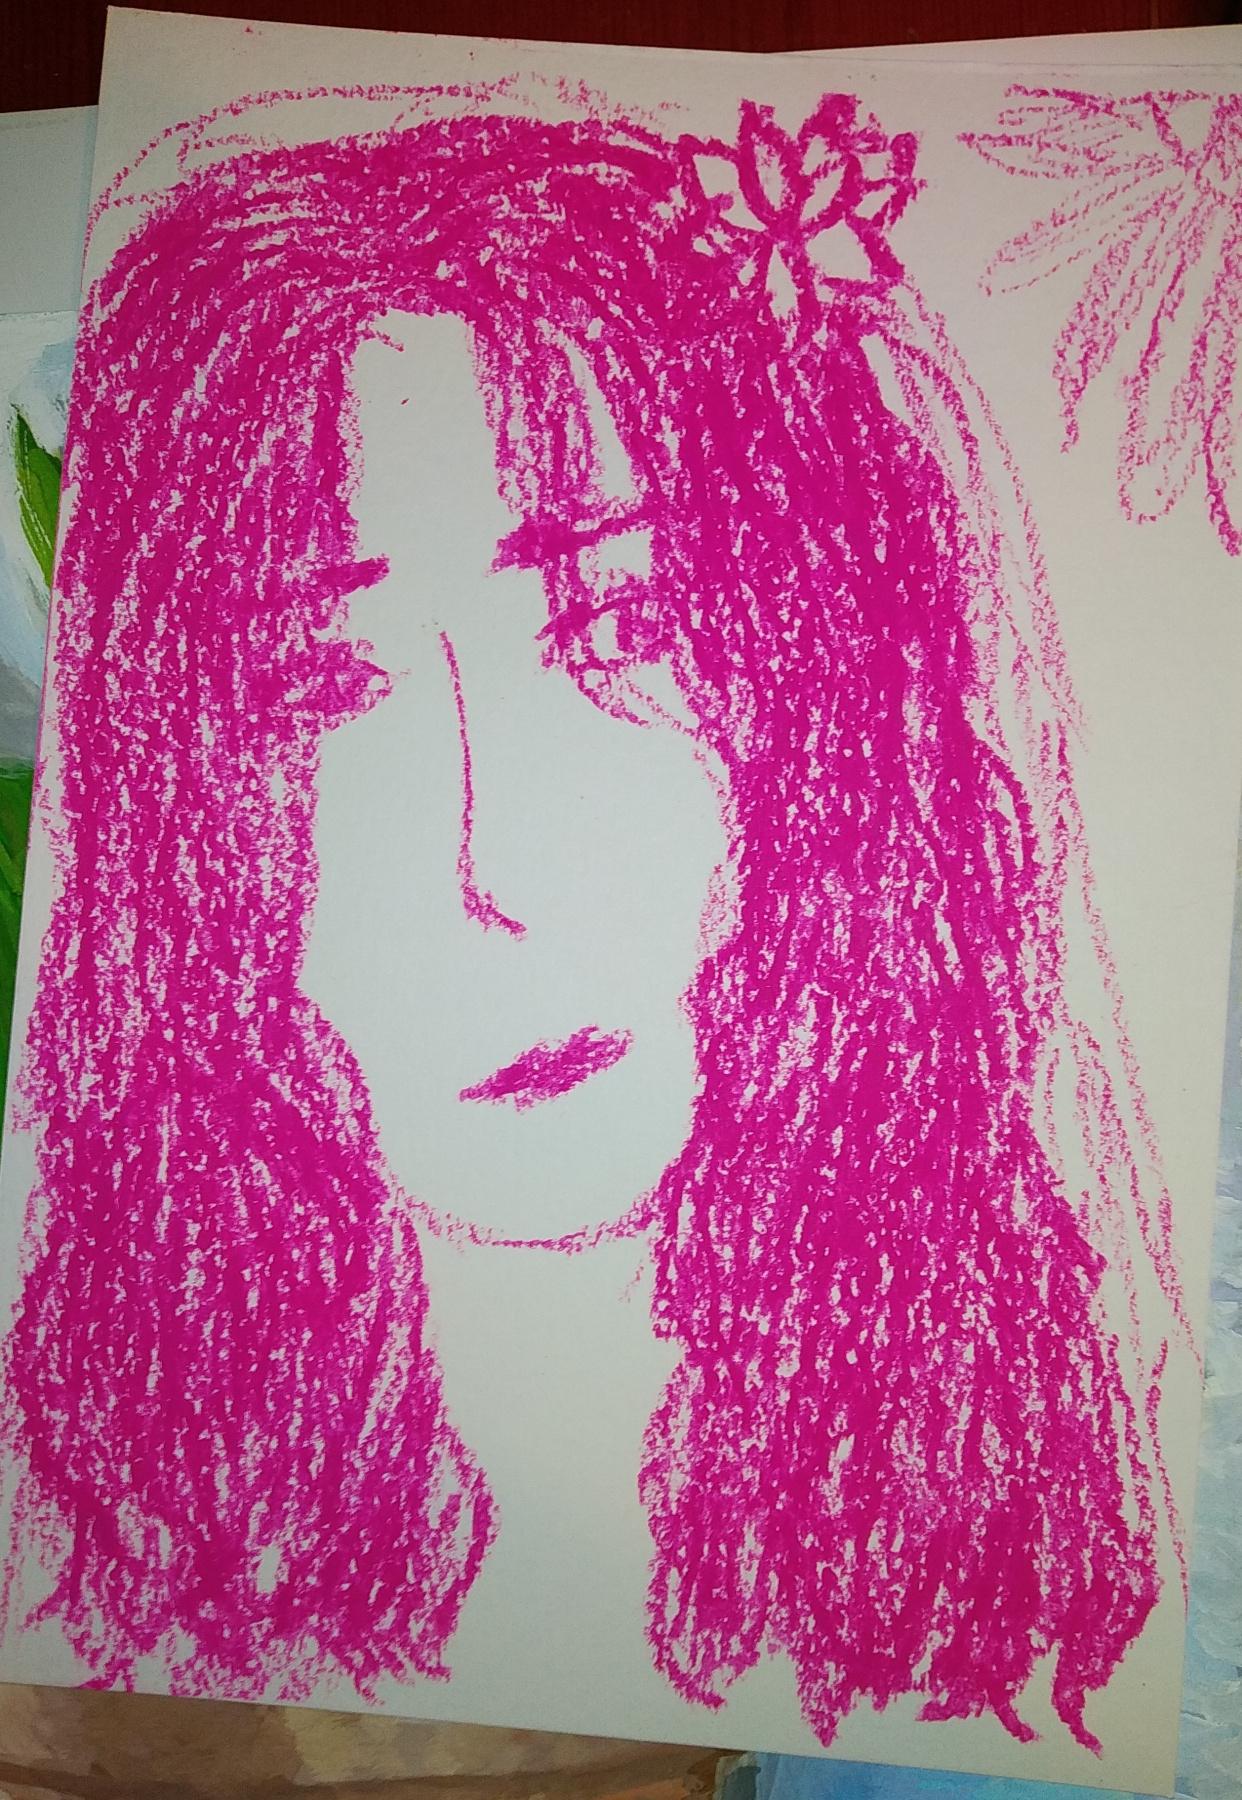 Zina Vladimirovna Parisva. Pink